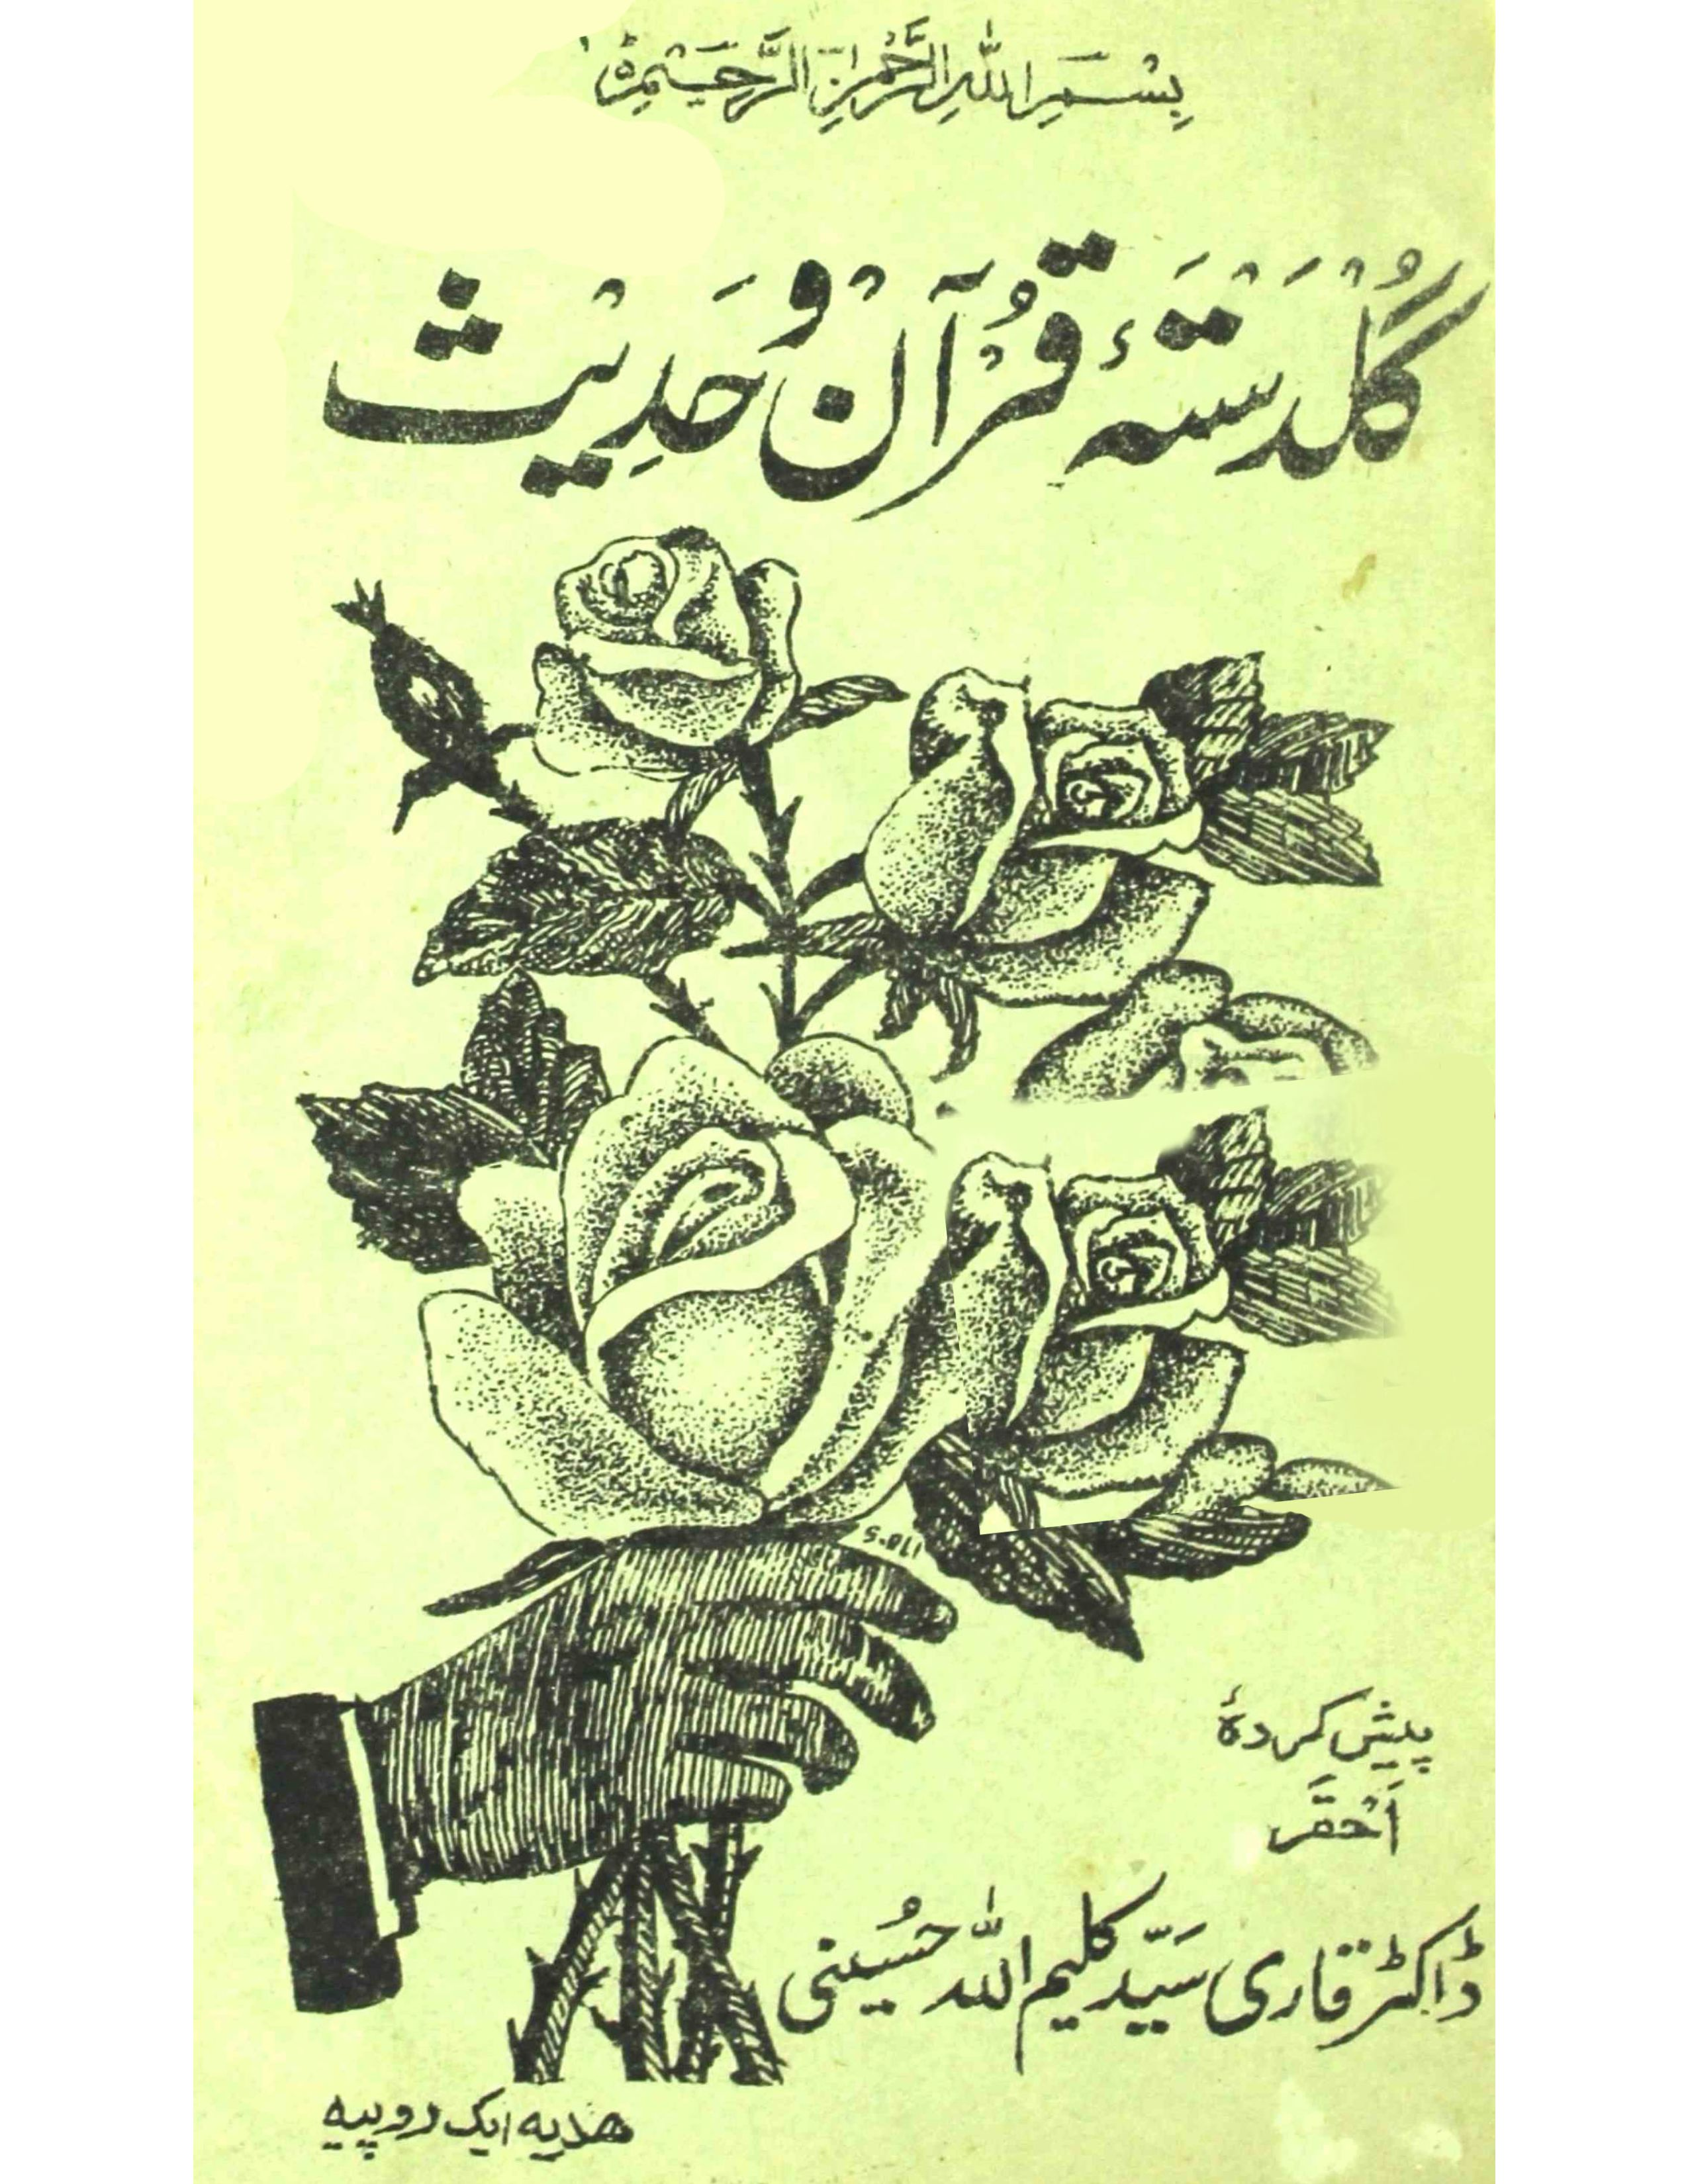 Guldasta-e-Quran-o-Hadees